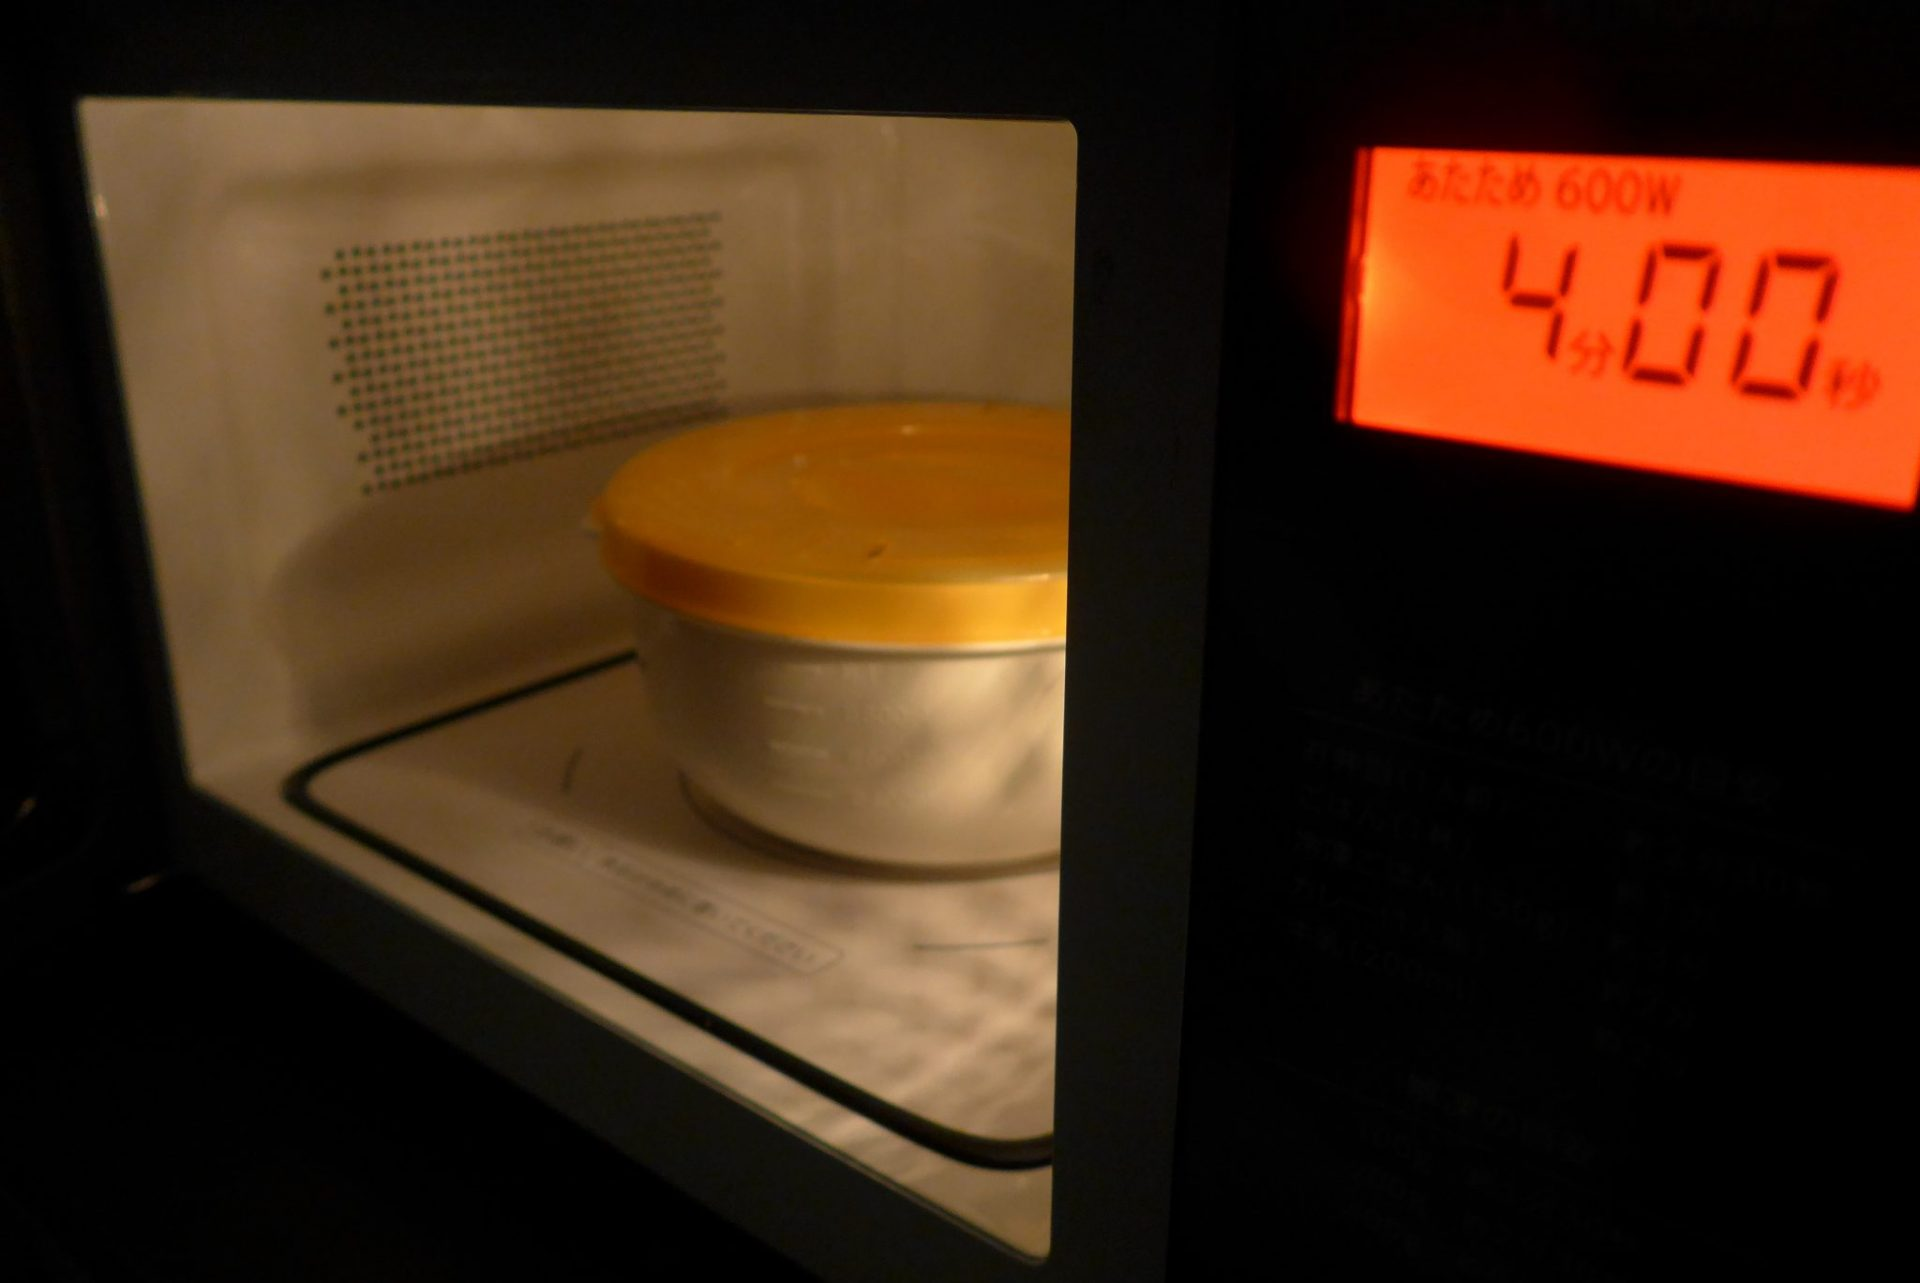 (K)電子レンジで作るラーメン!車中仮眠泊で簡単に食事ができる